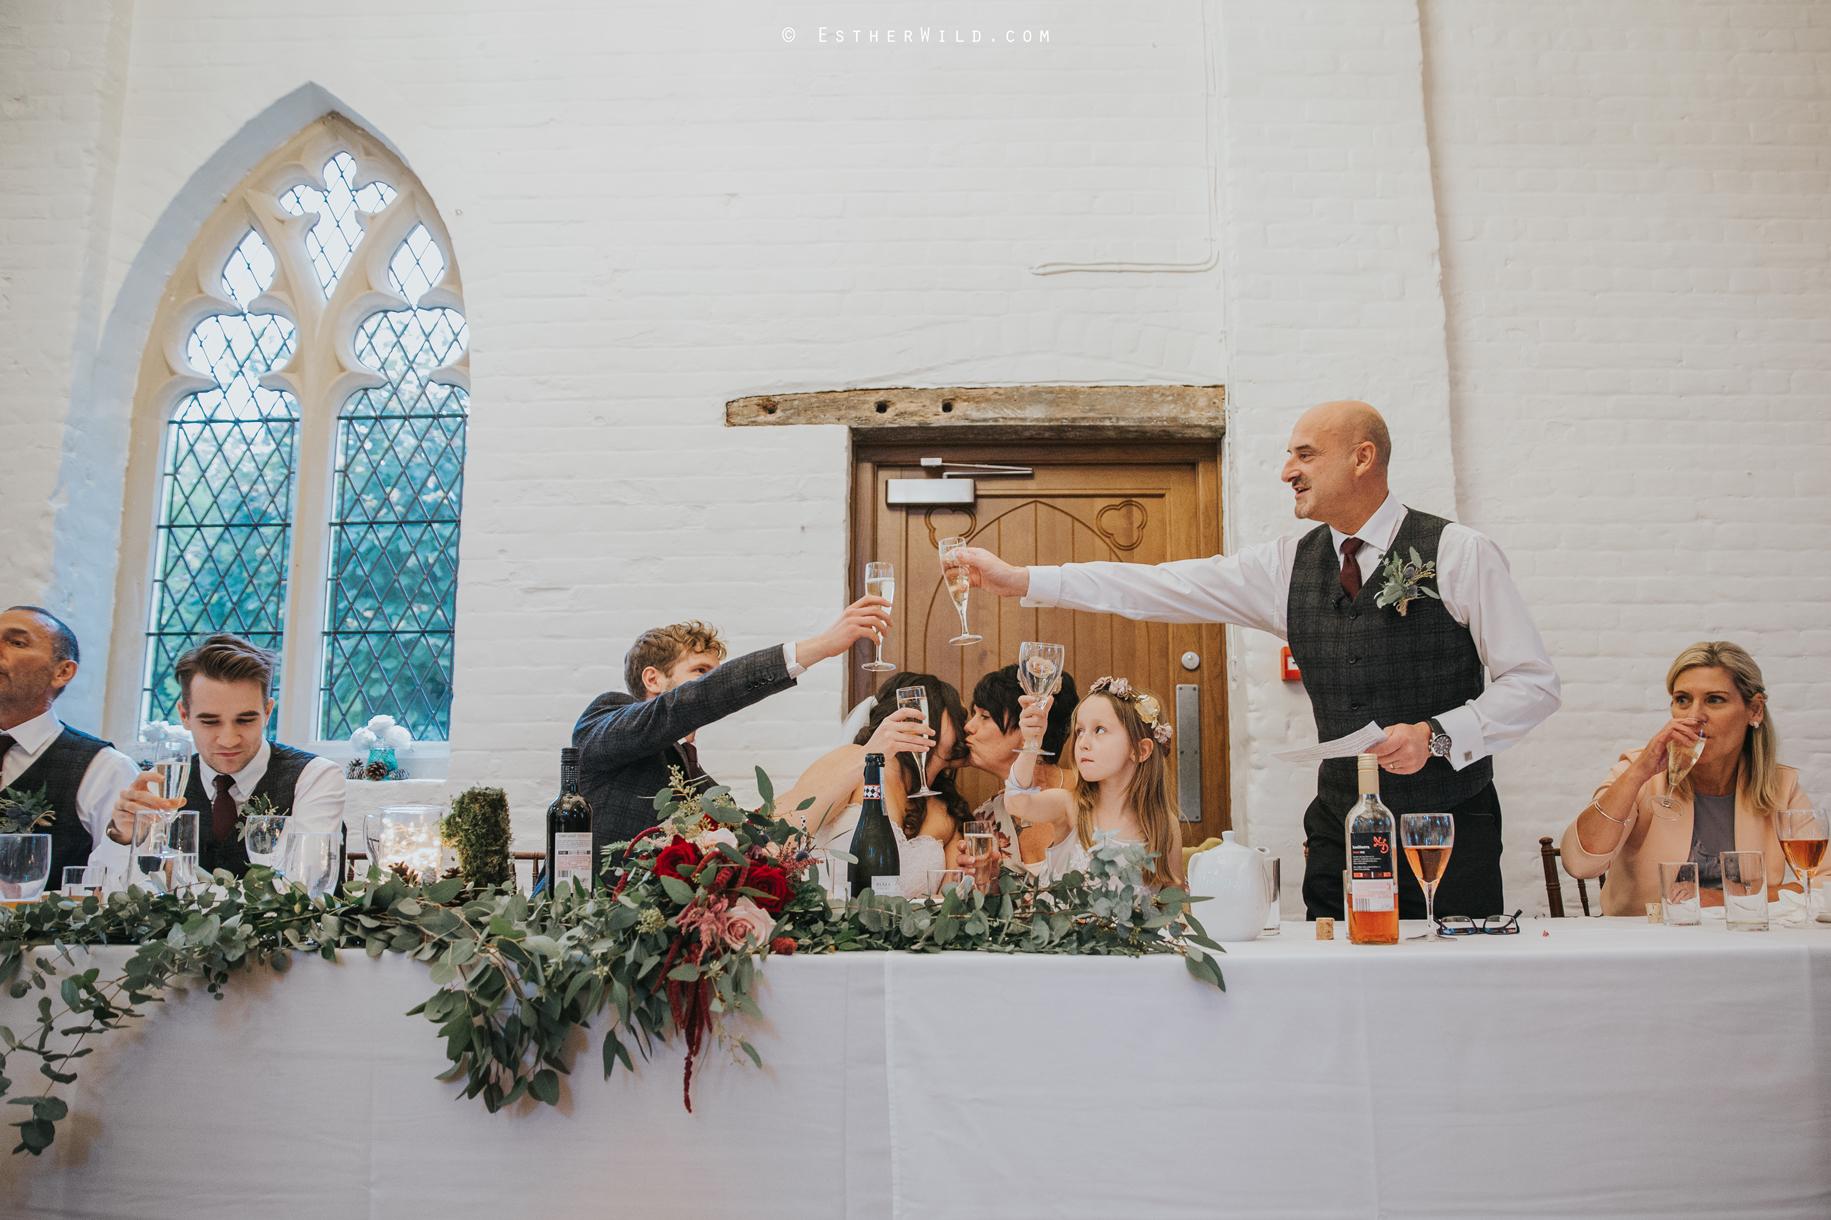 Reading_Room_Weddings_Alby_Norwich_Photographer_Esther_Wild_IMG_2129.jpg